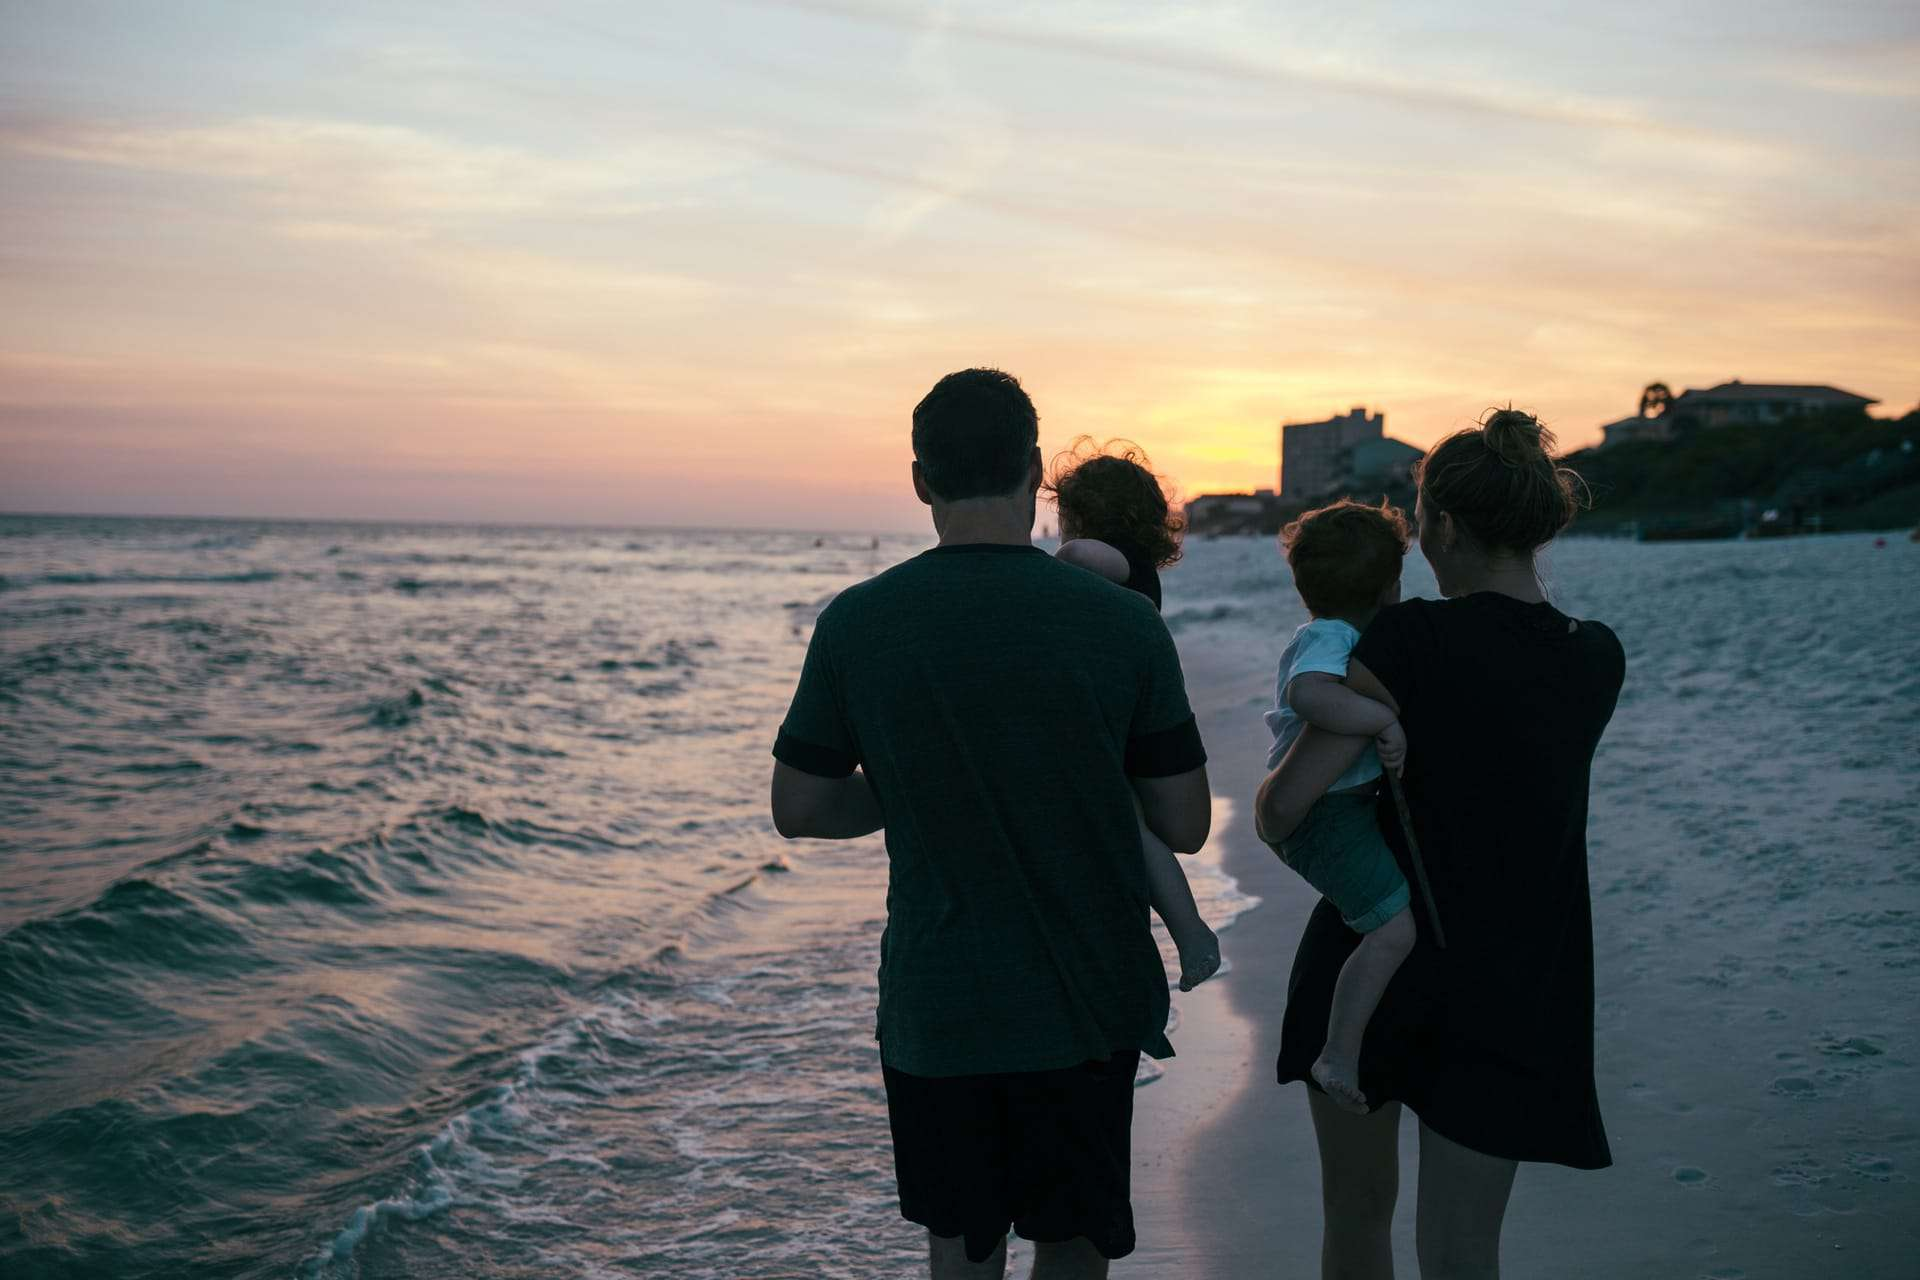 Life Insurance Needs Analysis